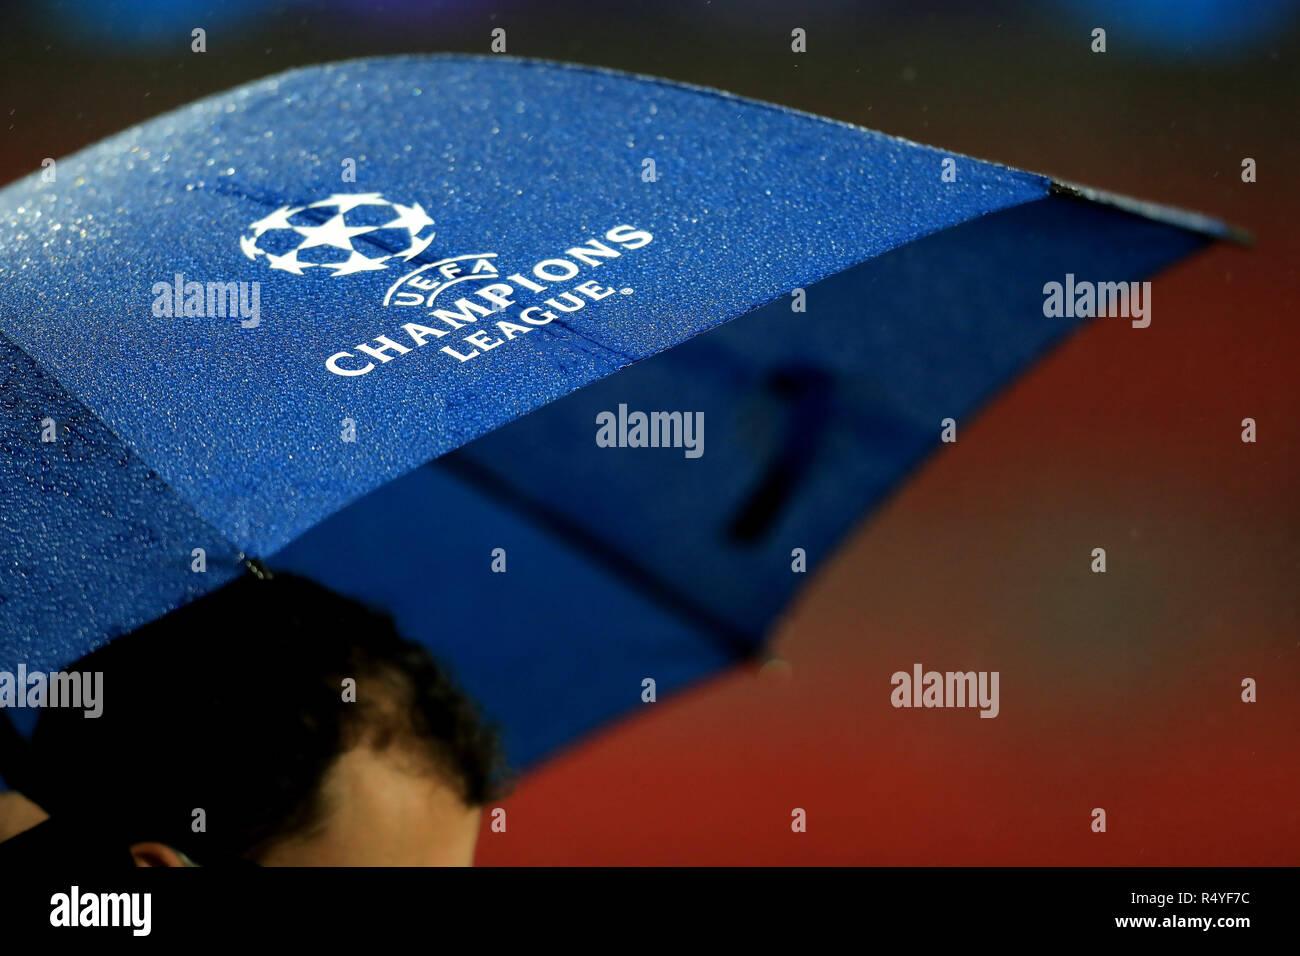 Tottenham Hotspur Logo Stock Photos & Tottenham Hotspur Logo